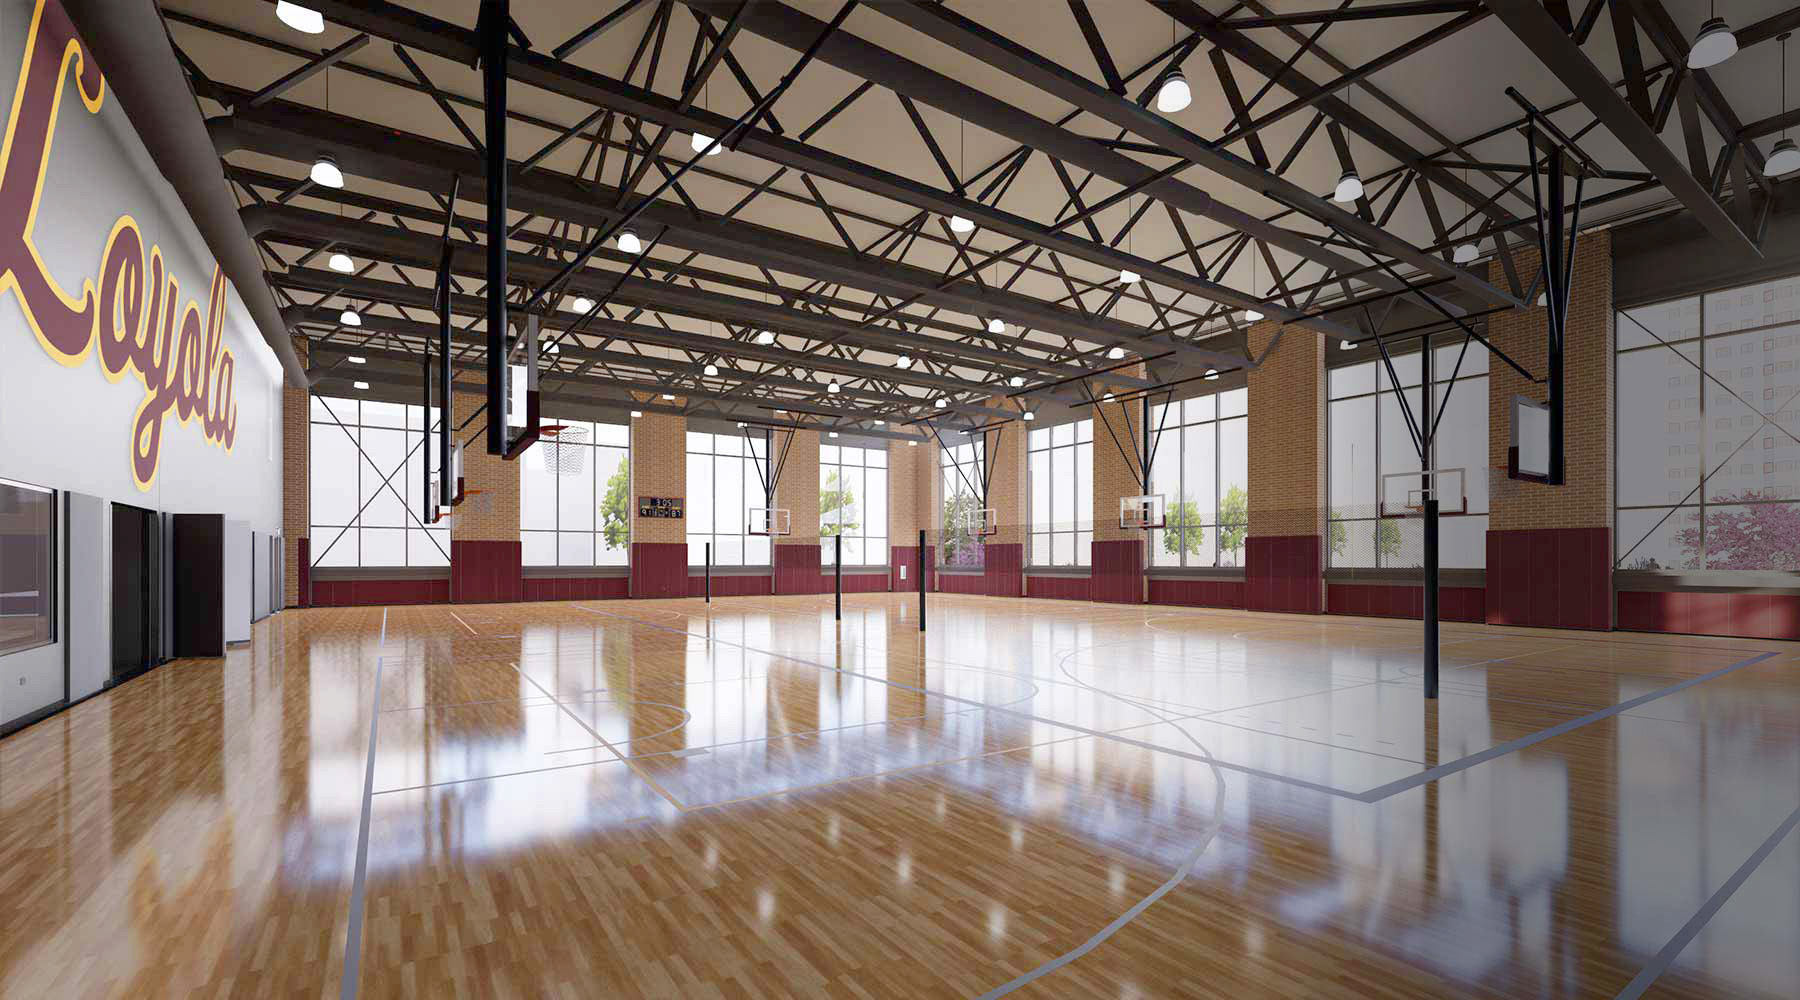 The Alfie Norville Practice Facility